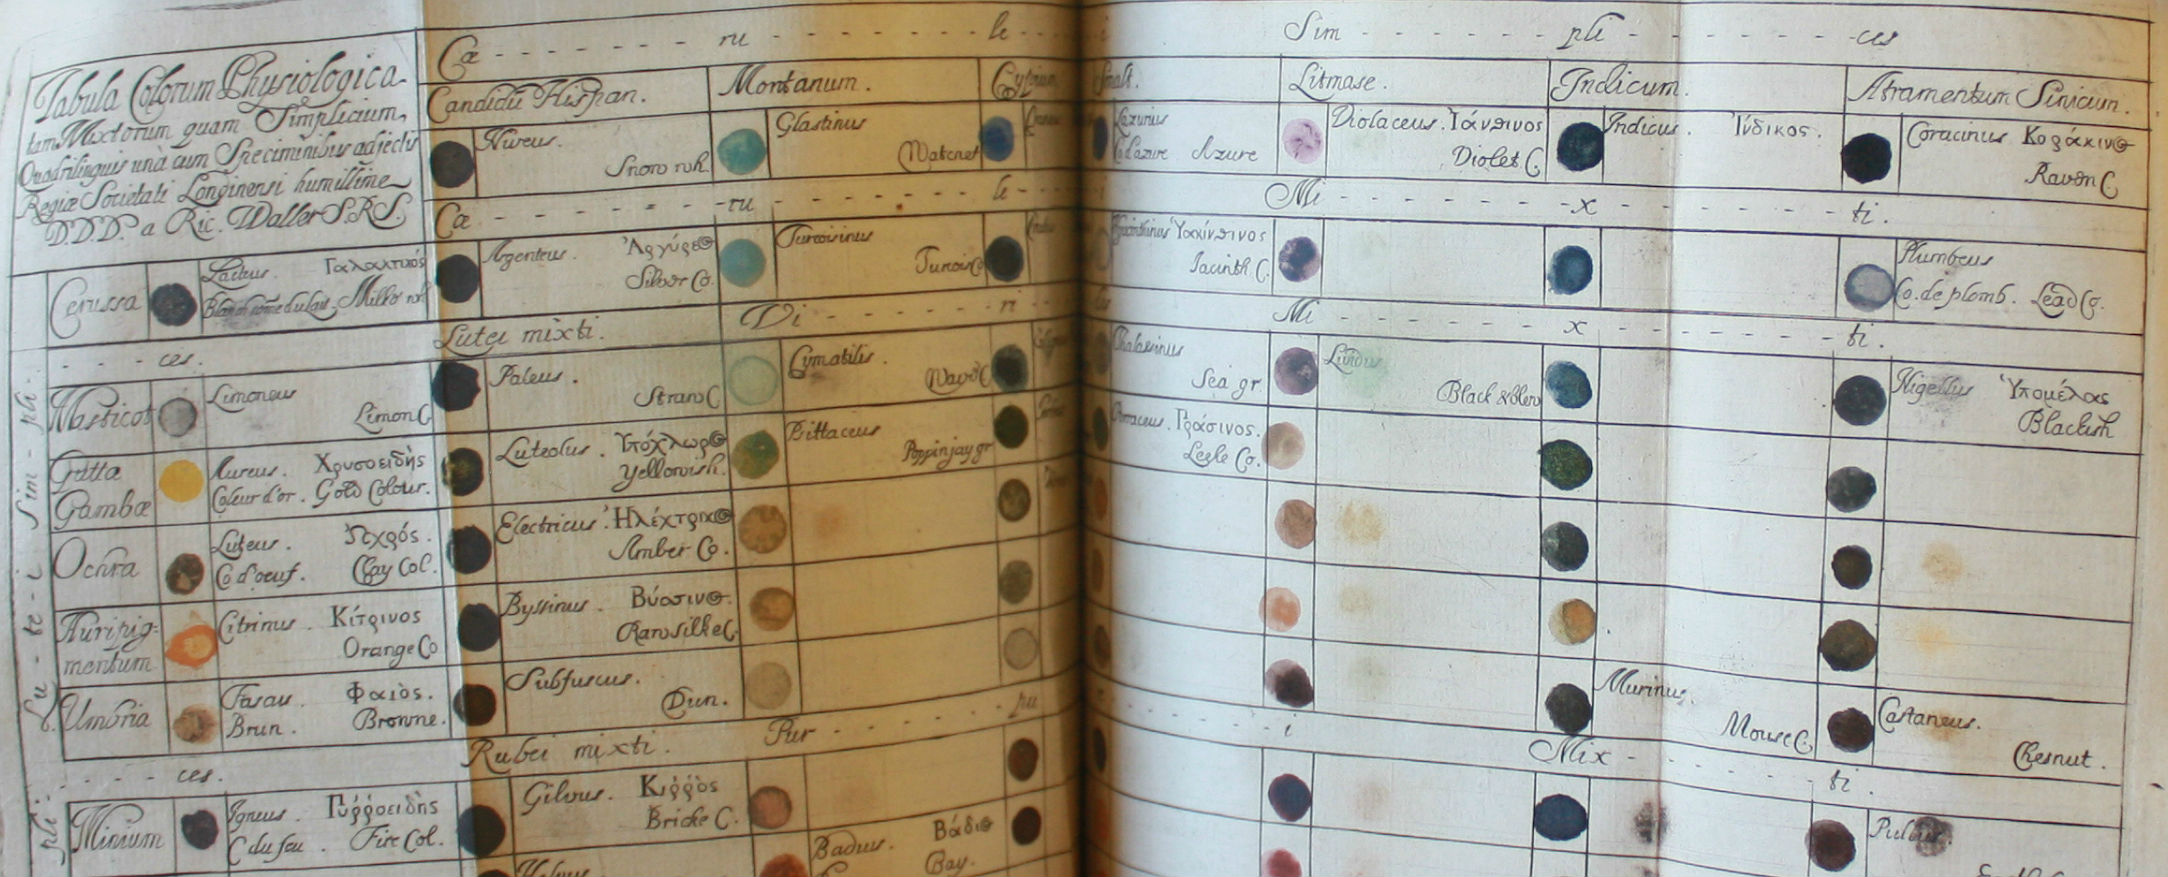 1500-h-14-v16-p27-colours-small